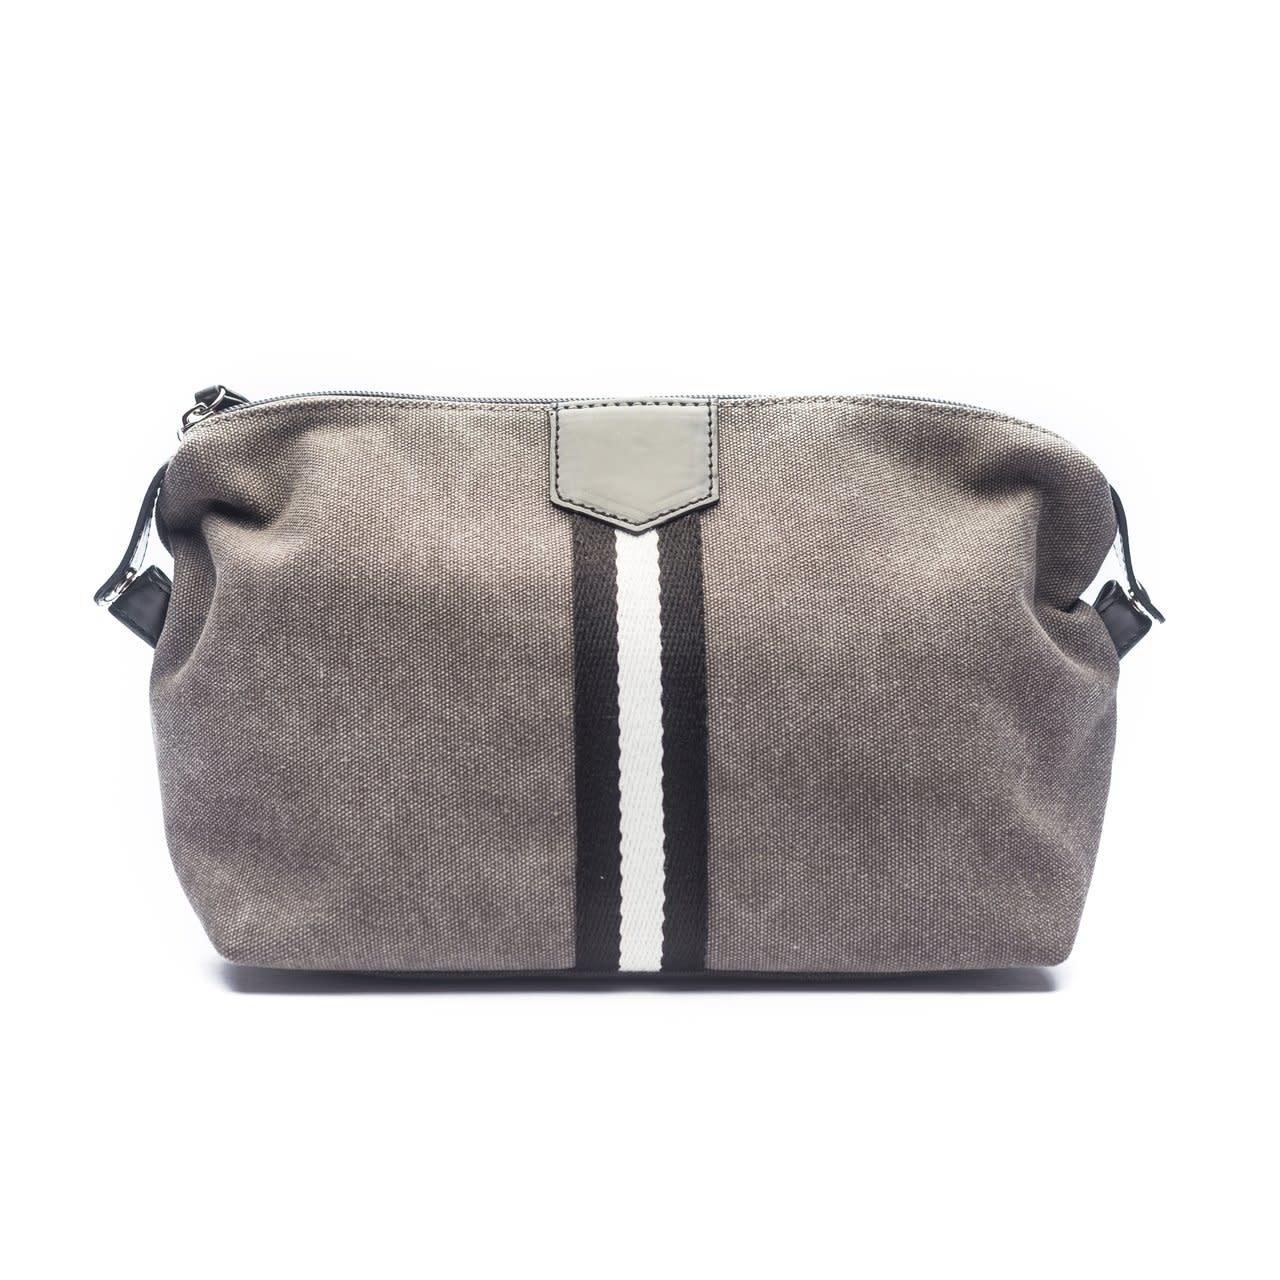 Brouk & Co. Grey Original Toiletry Bag